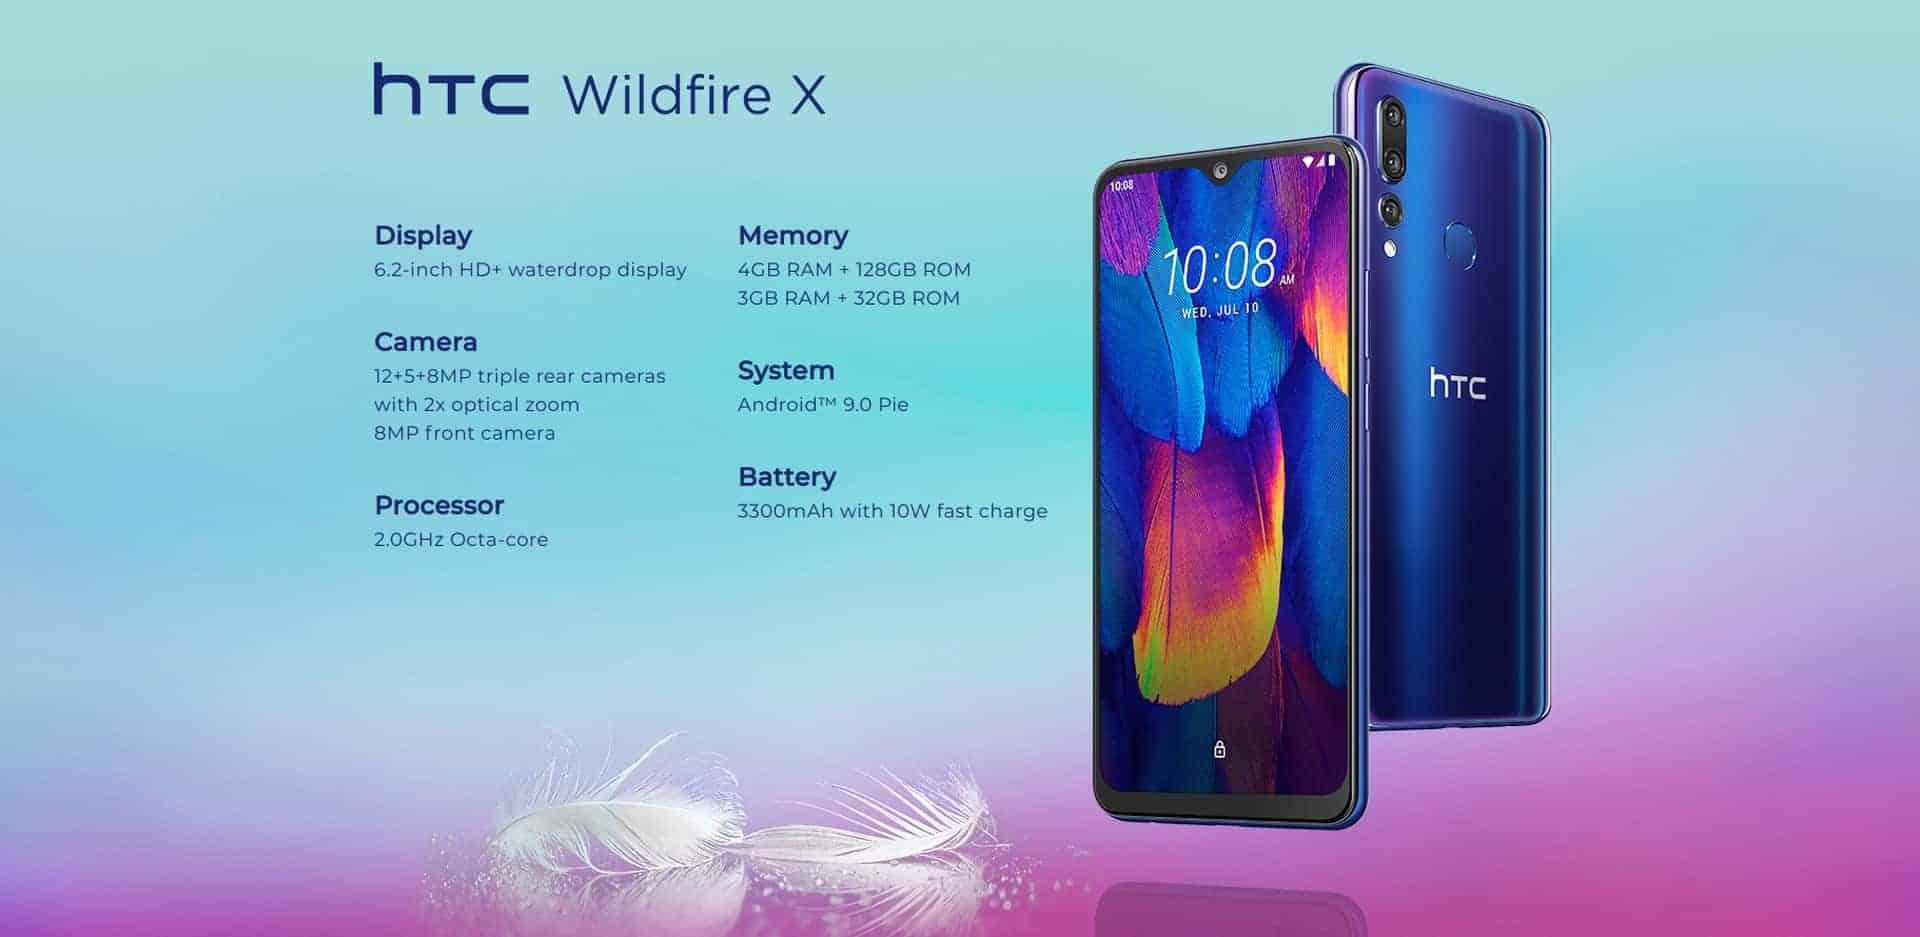 HTC Wildfire X image 3